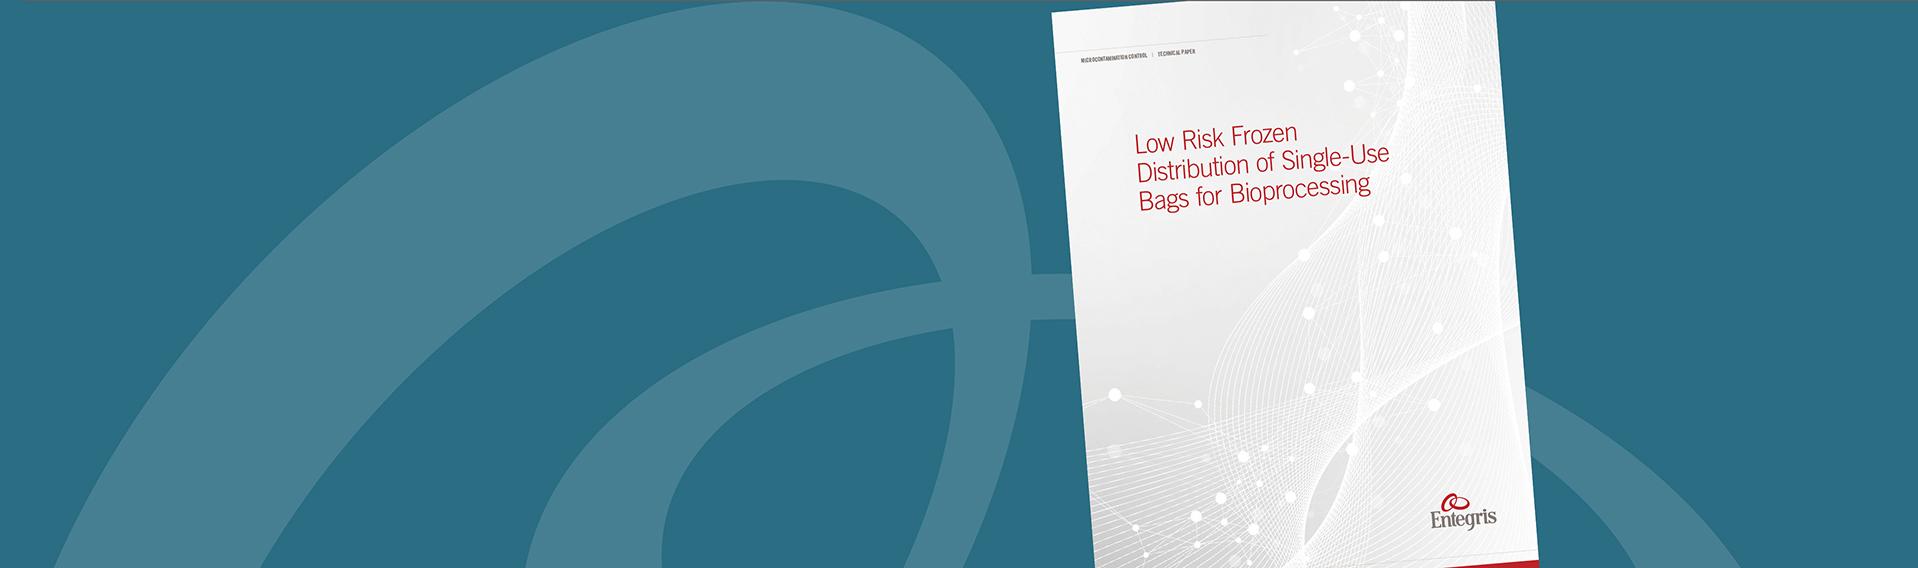 low-risk-distribution-techpaper-hubspot-11243-desktop-1918x568